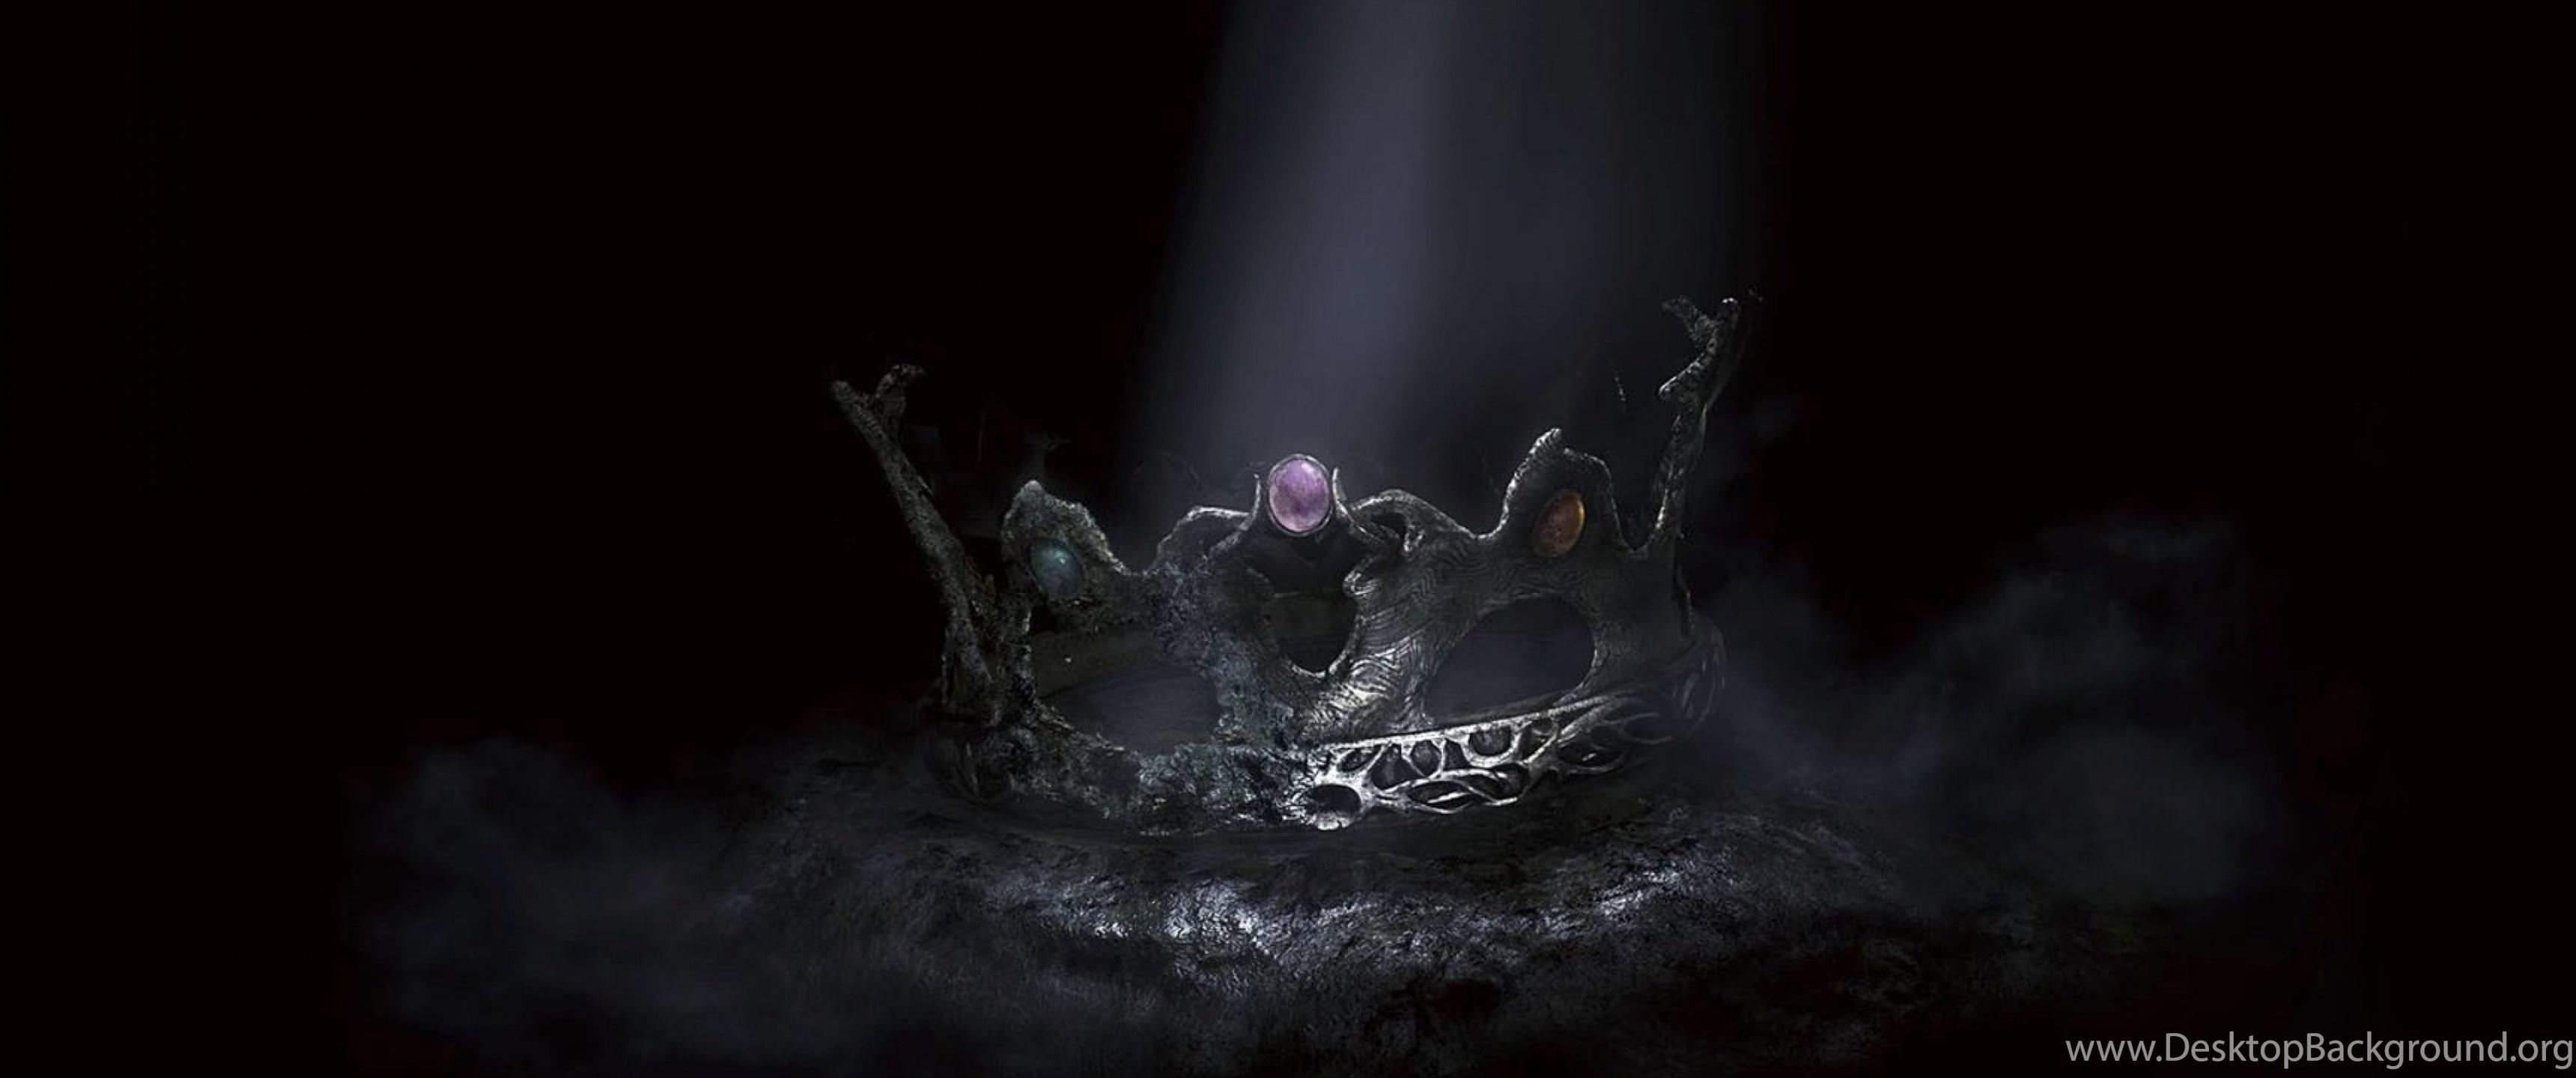 Dark Souls 3 21 9: Download Wallpapers 3840x2400 Dark Souls 2, Crown Of The